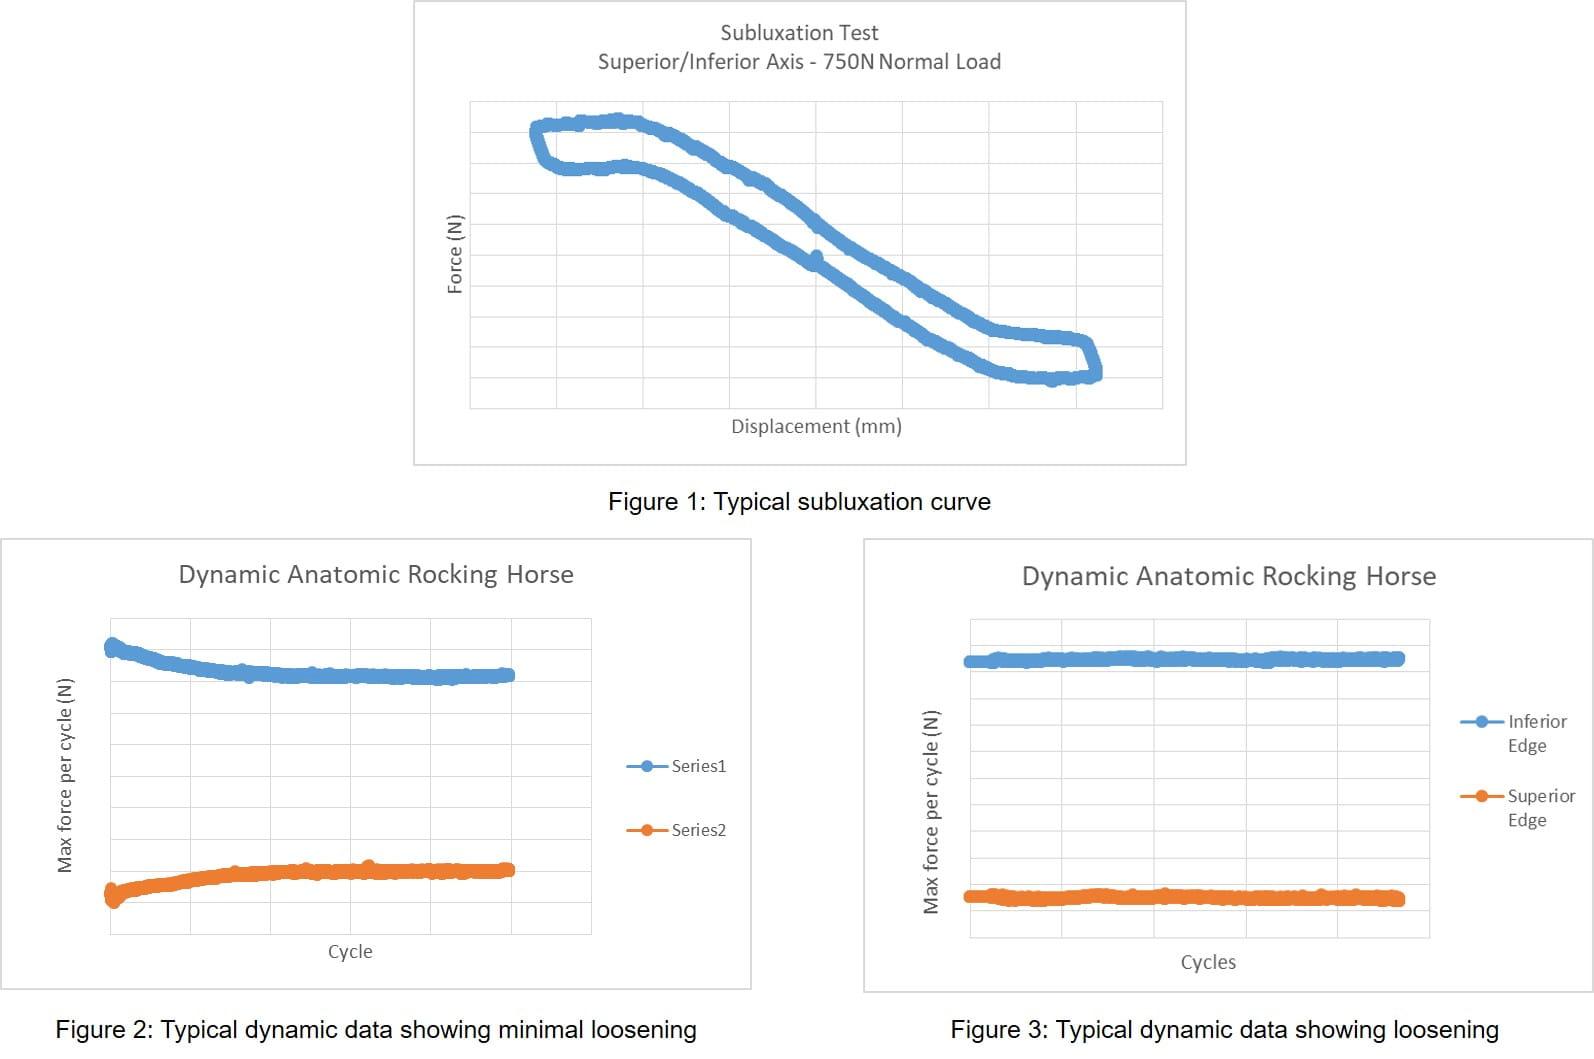 ASTM F2028 Test Figures